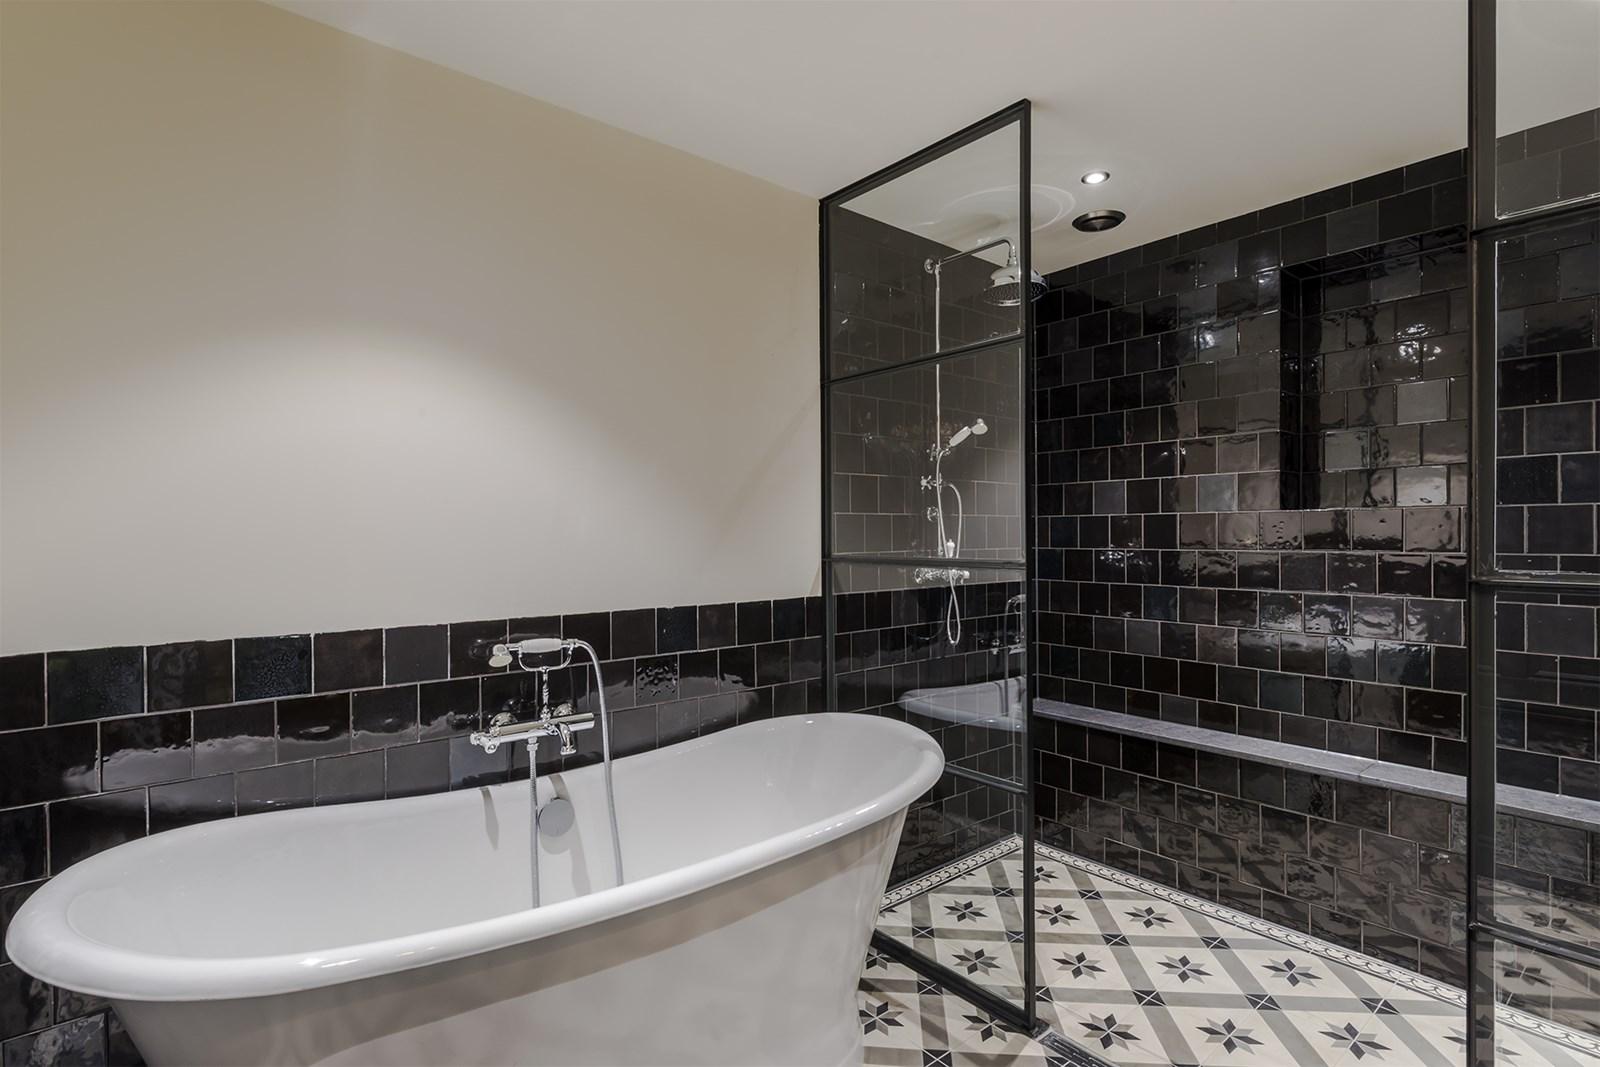 Souterrain badkamer in klassieke portugese stijl homease